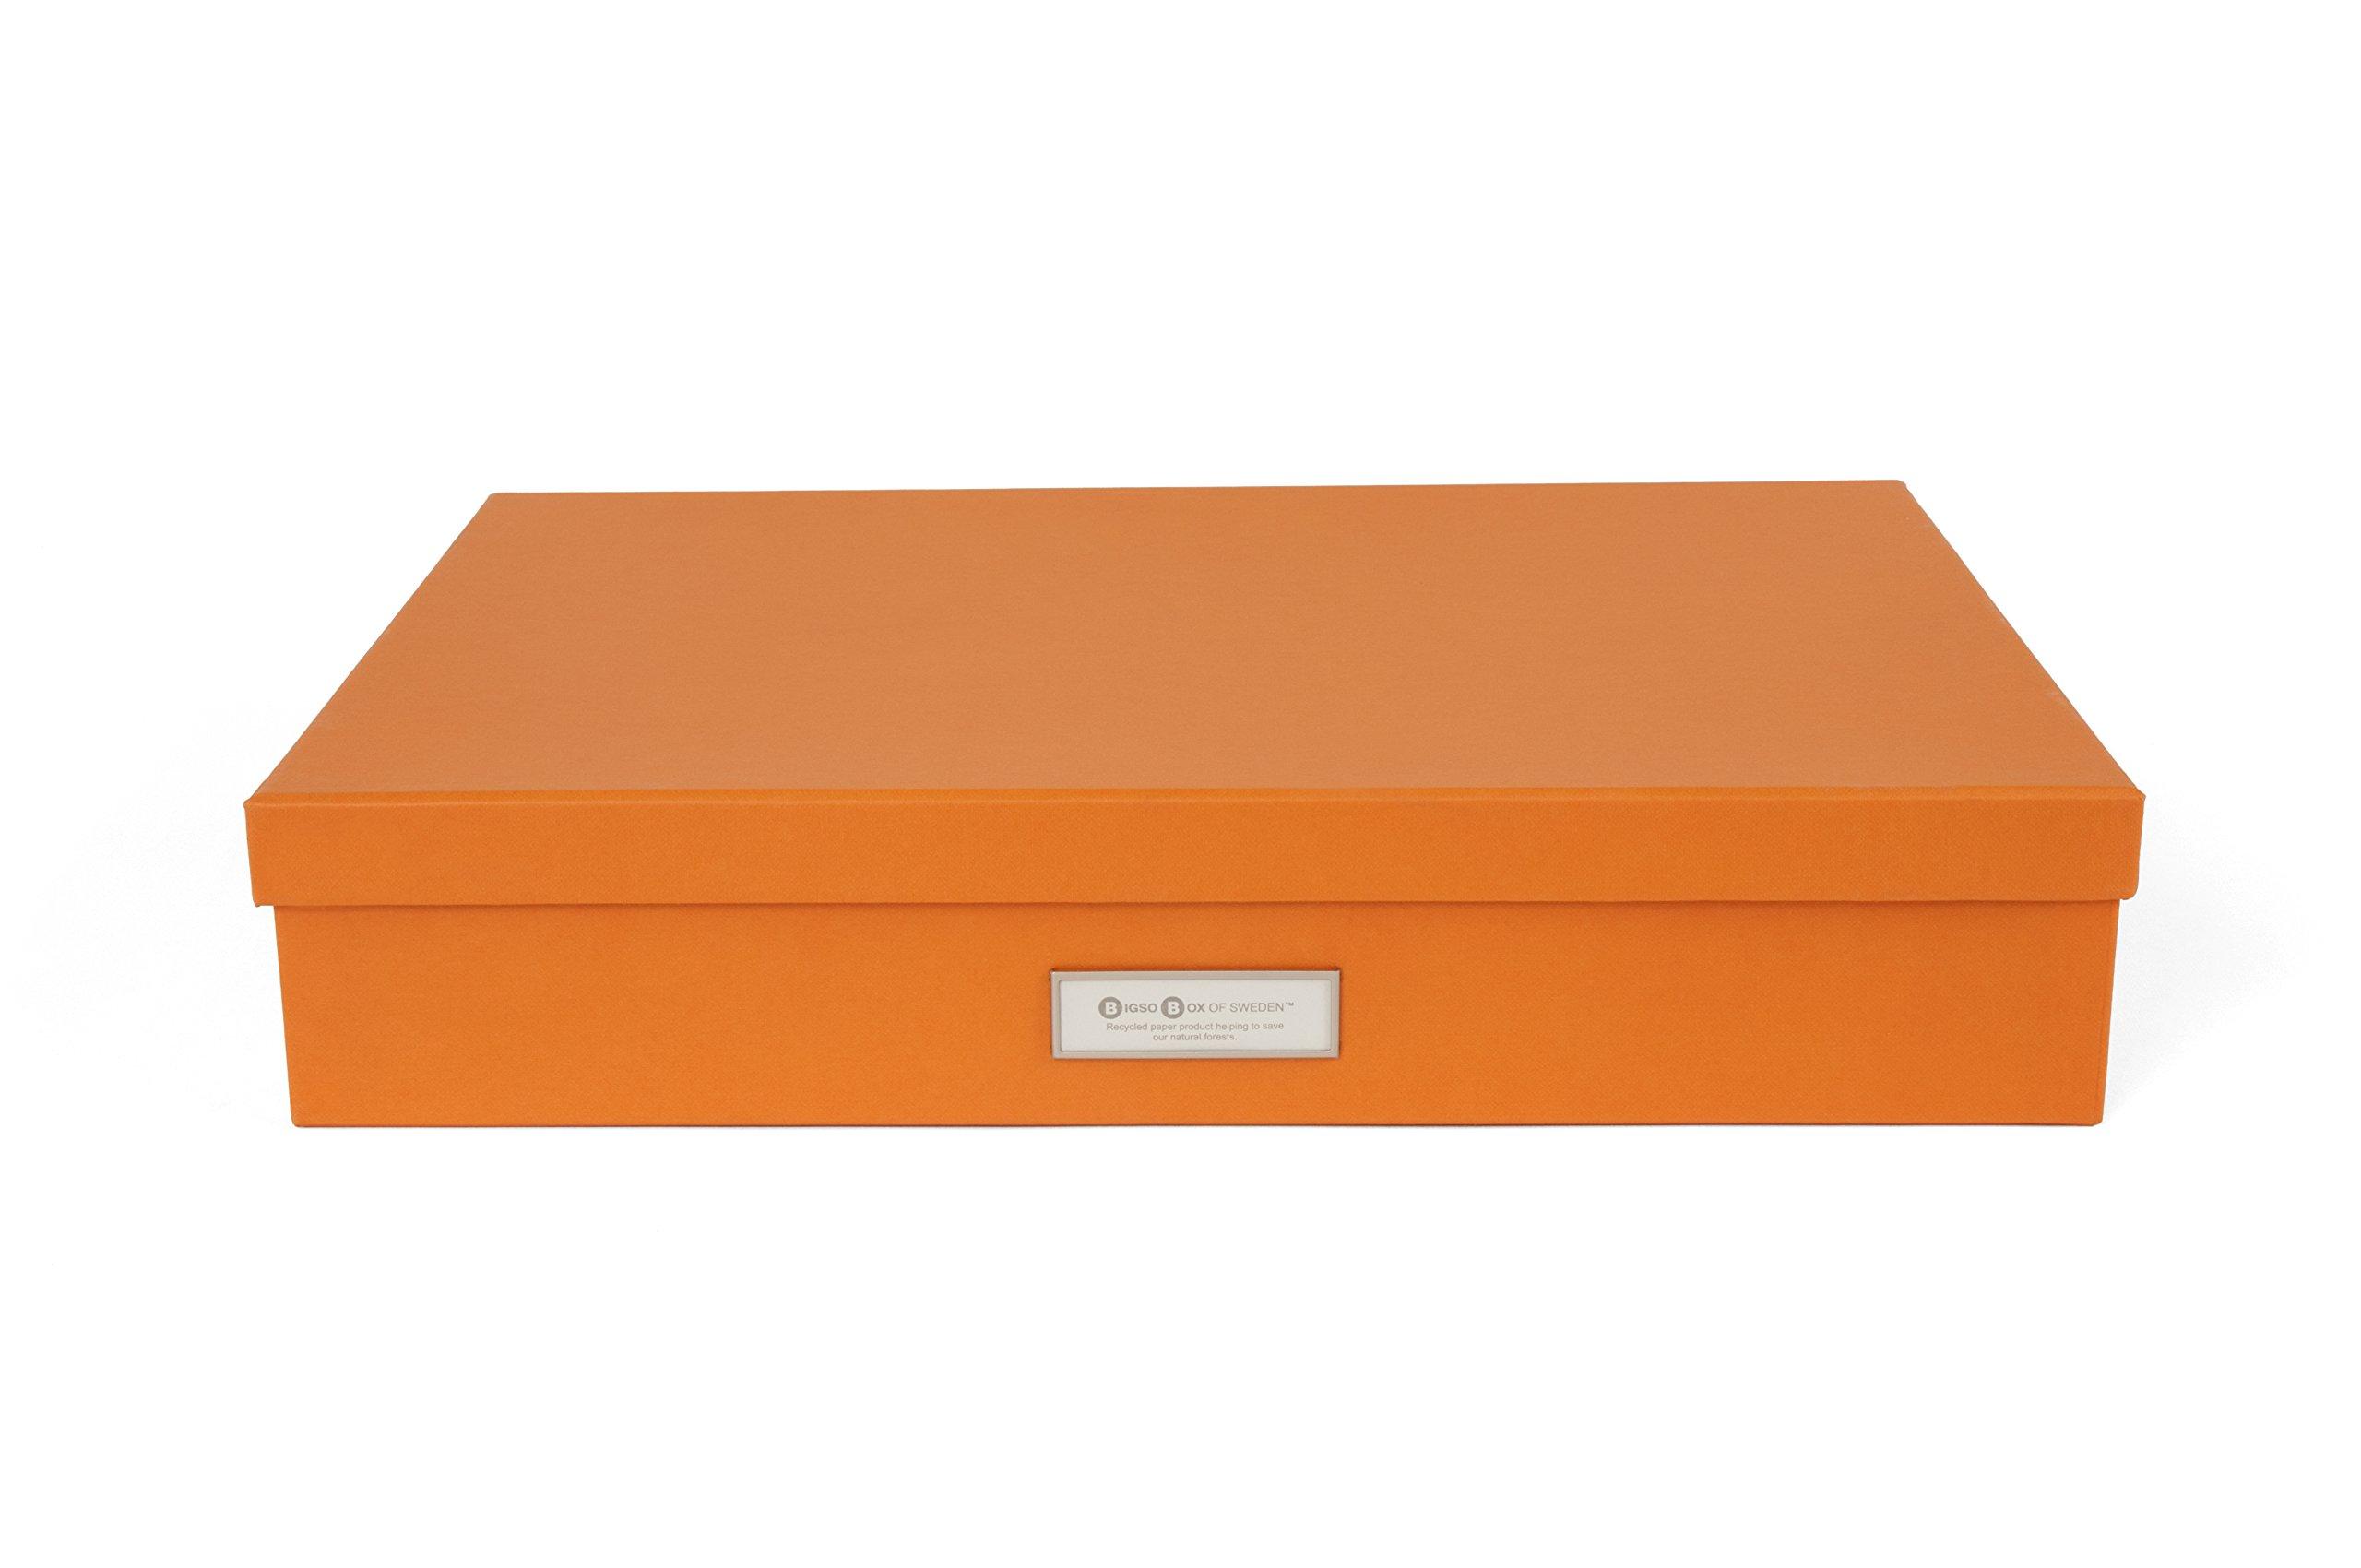 Bigso Sverker Document Storage Box, Orange by Bigso (Image #3)